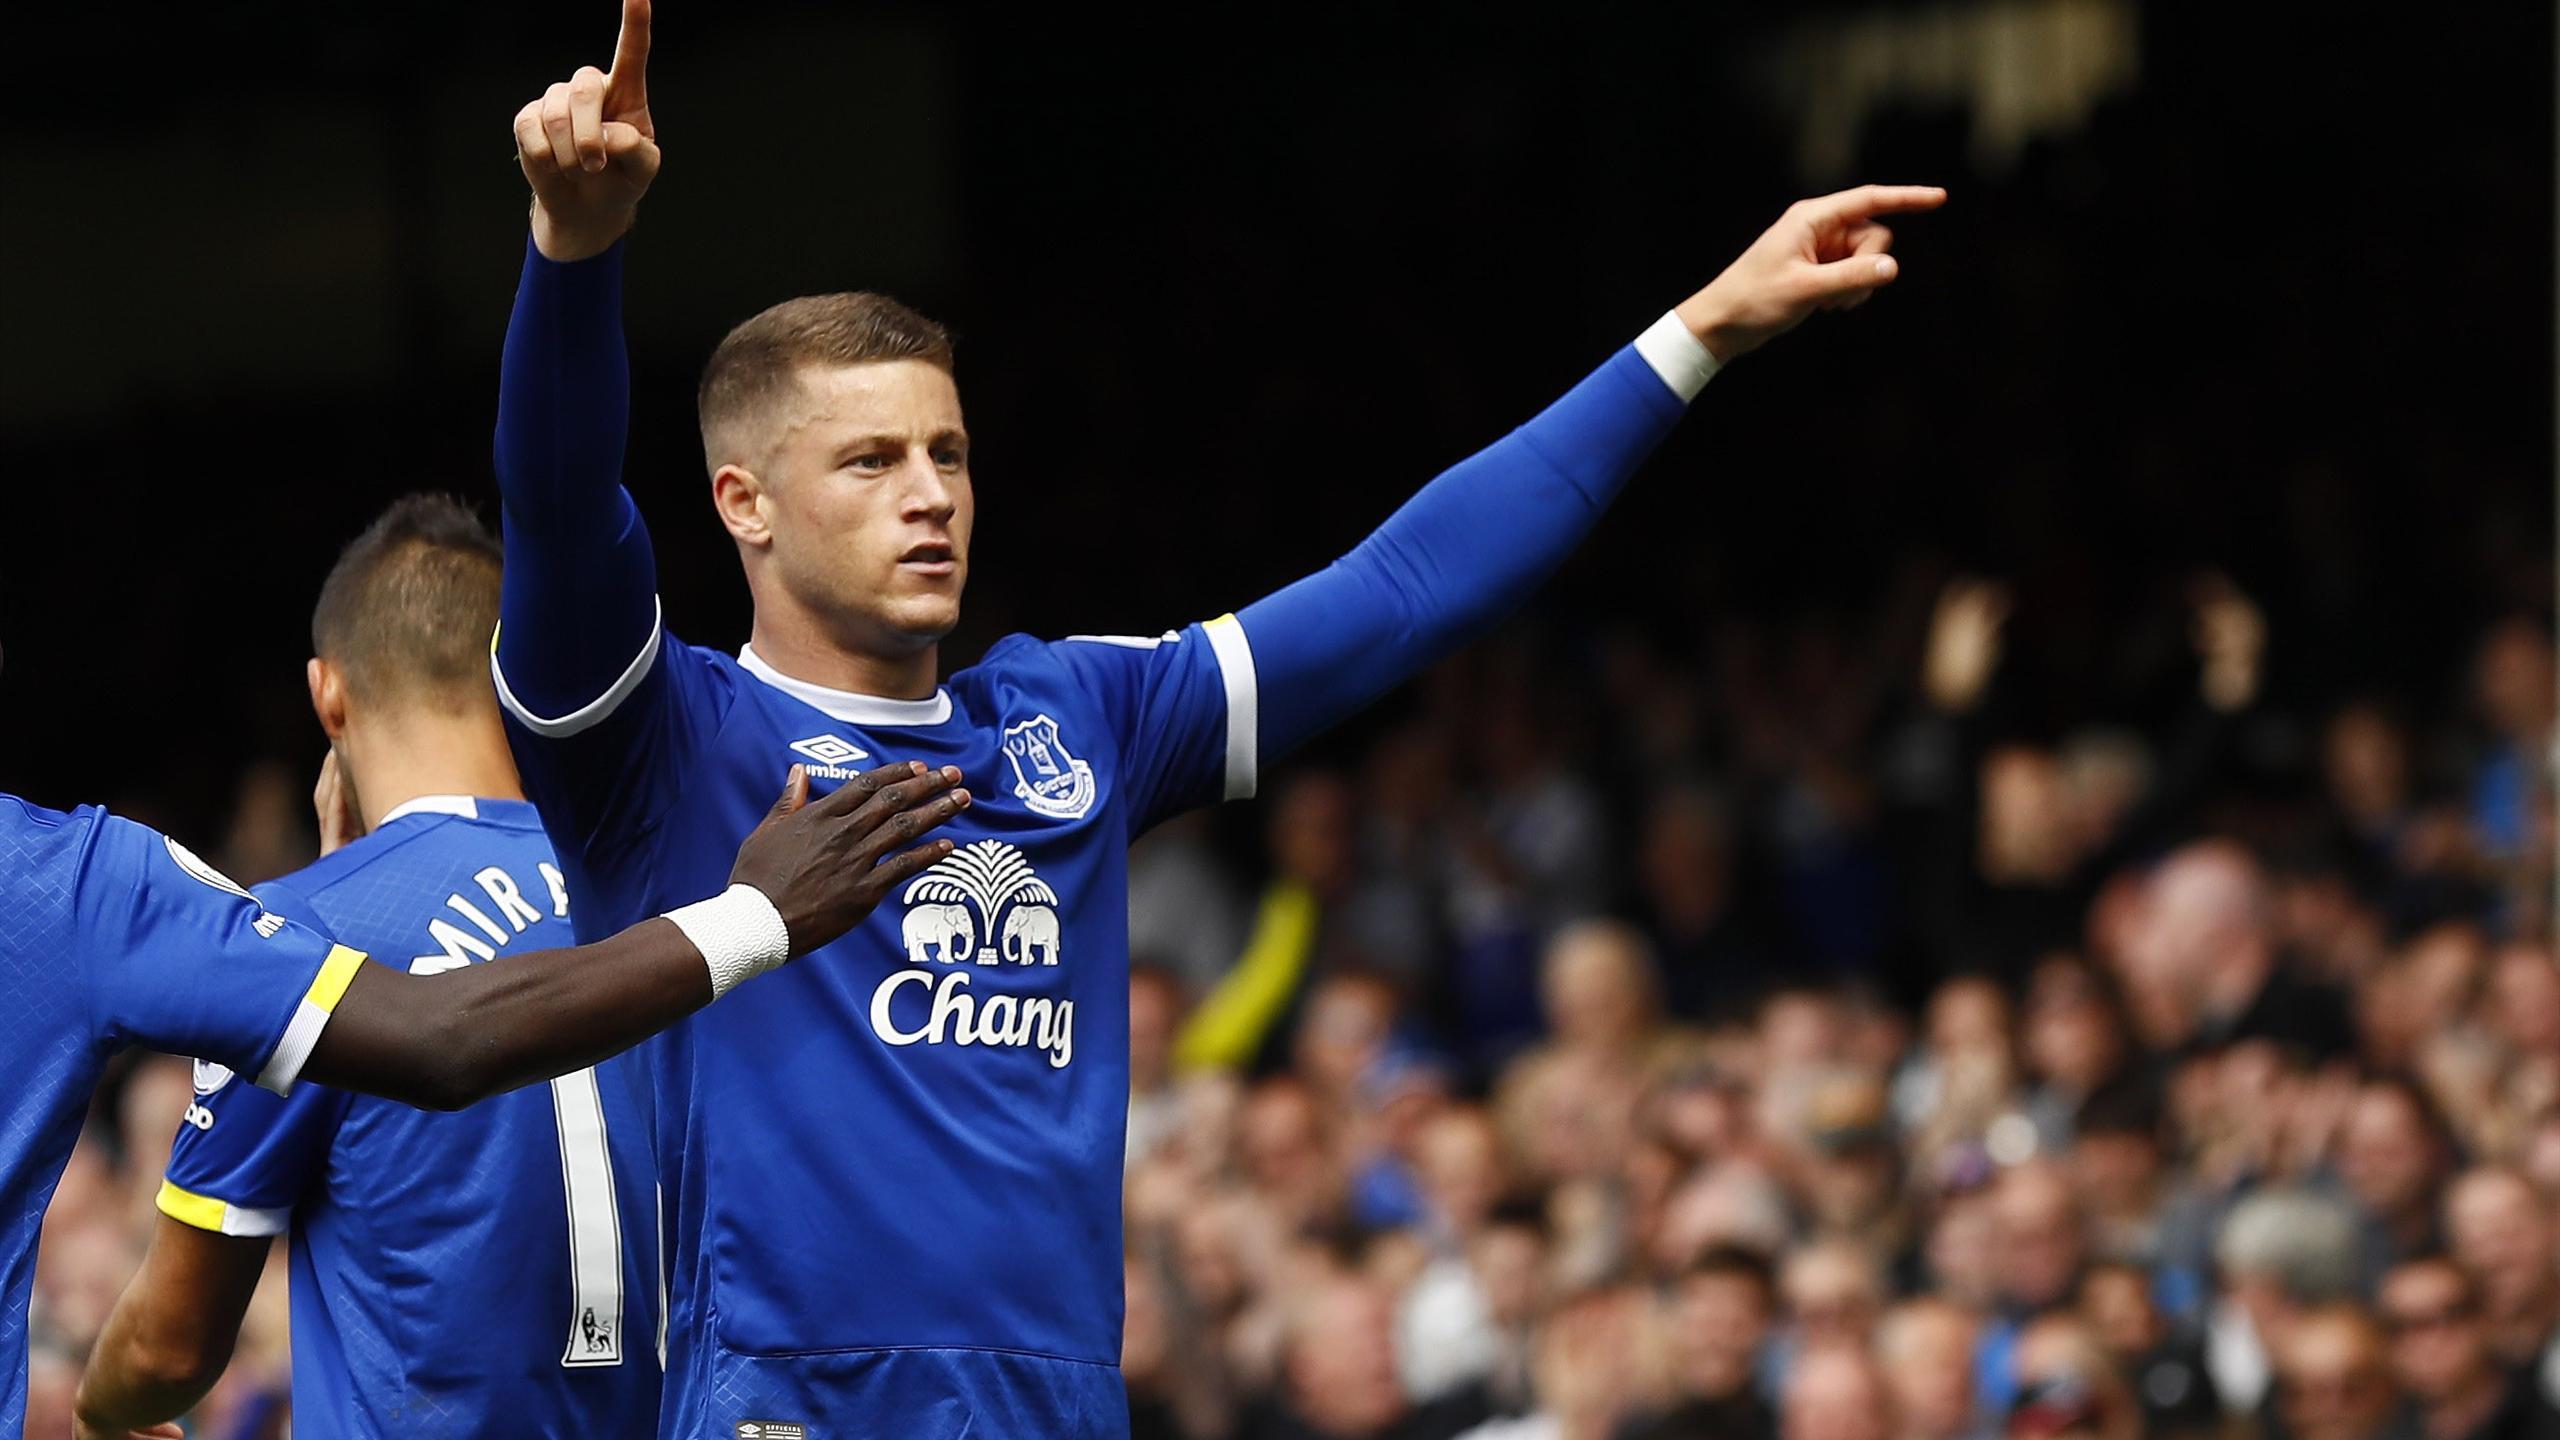 Everton's Ross Barkley celebrates scoring their first goal